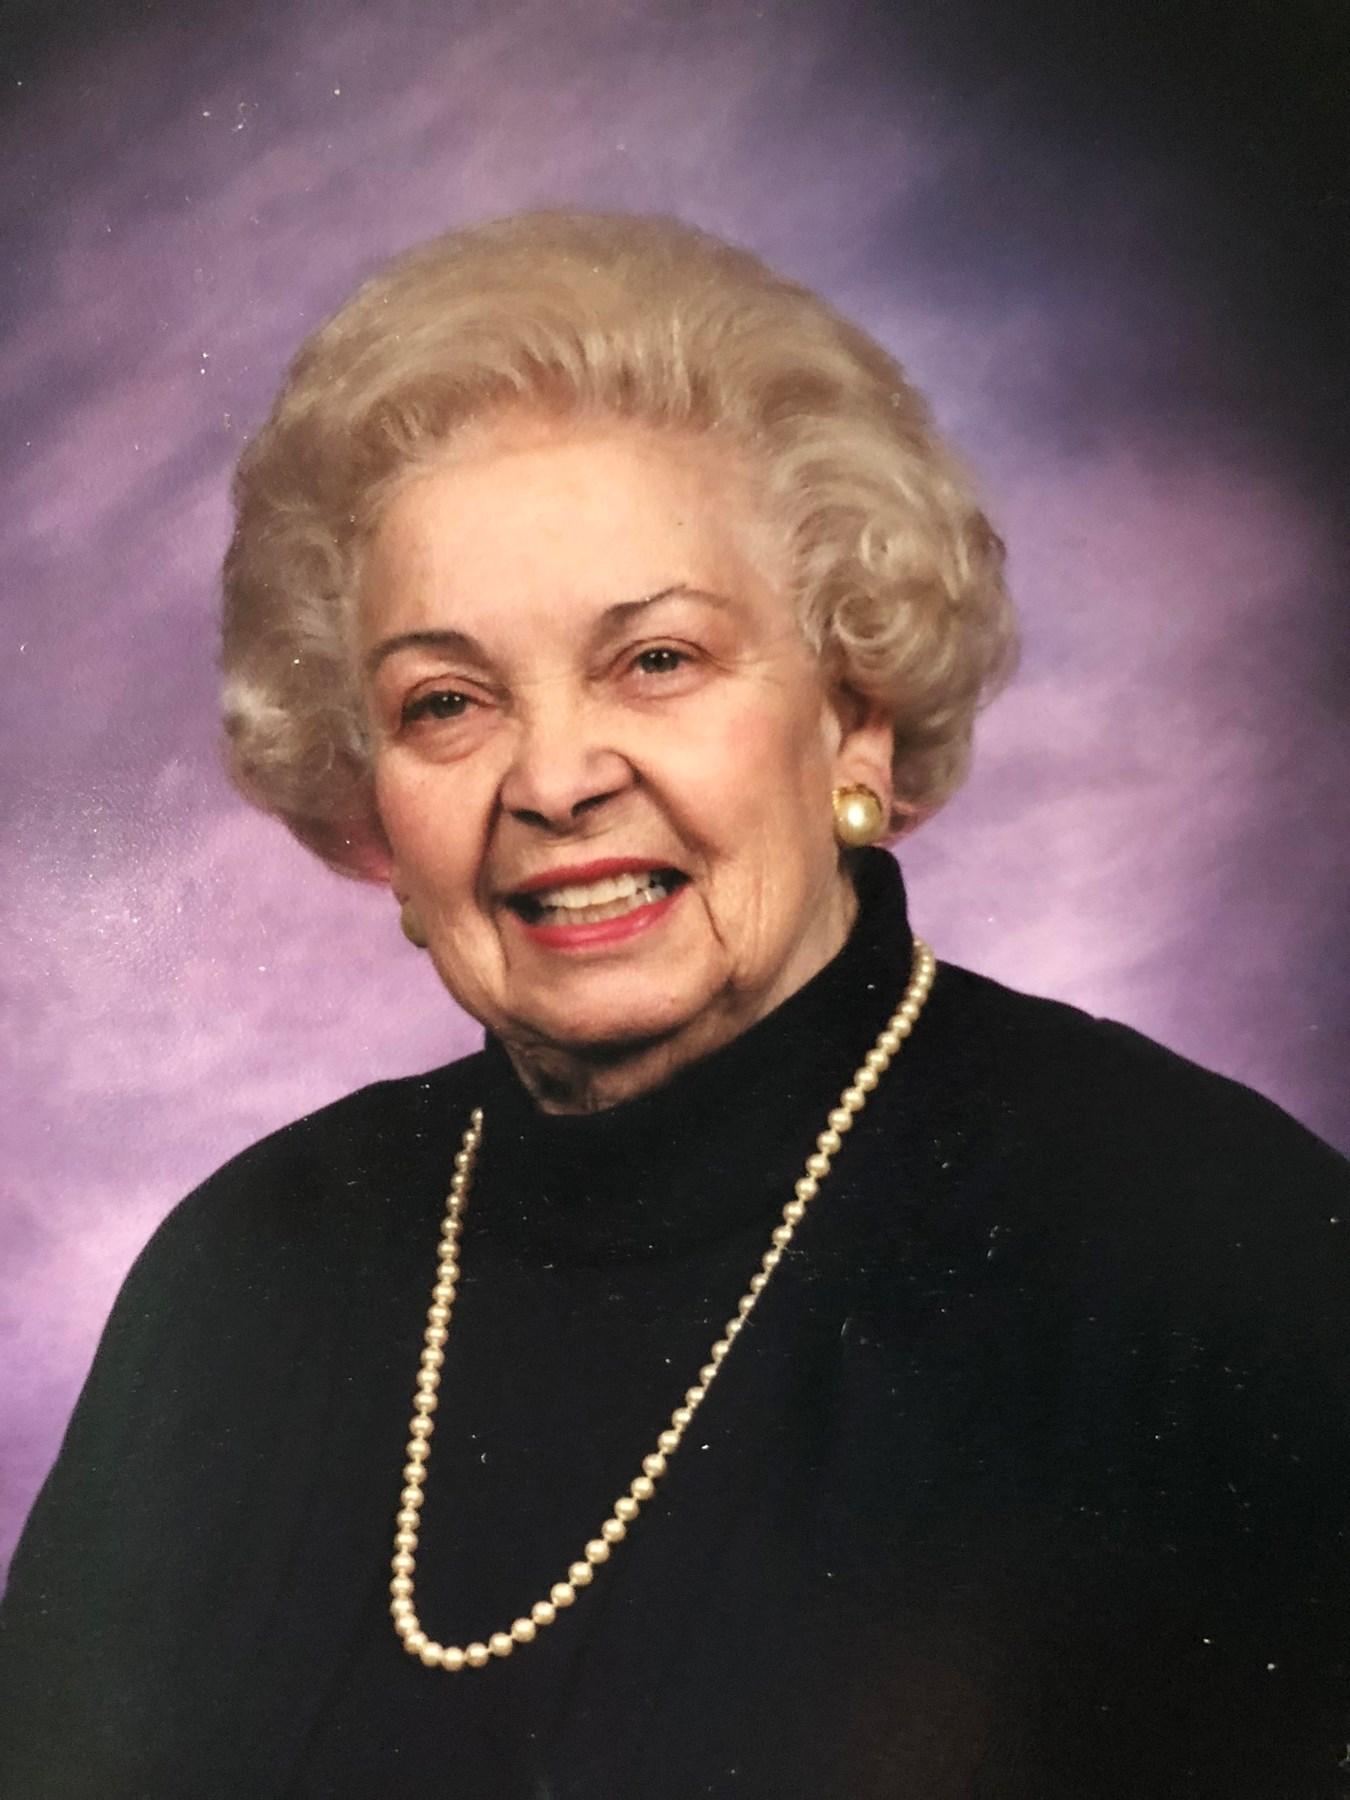 Beatrice D Avignon Avis beatrice clark avis de décès - springfield, va